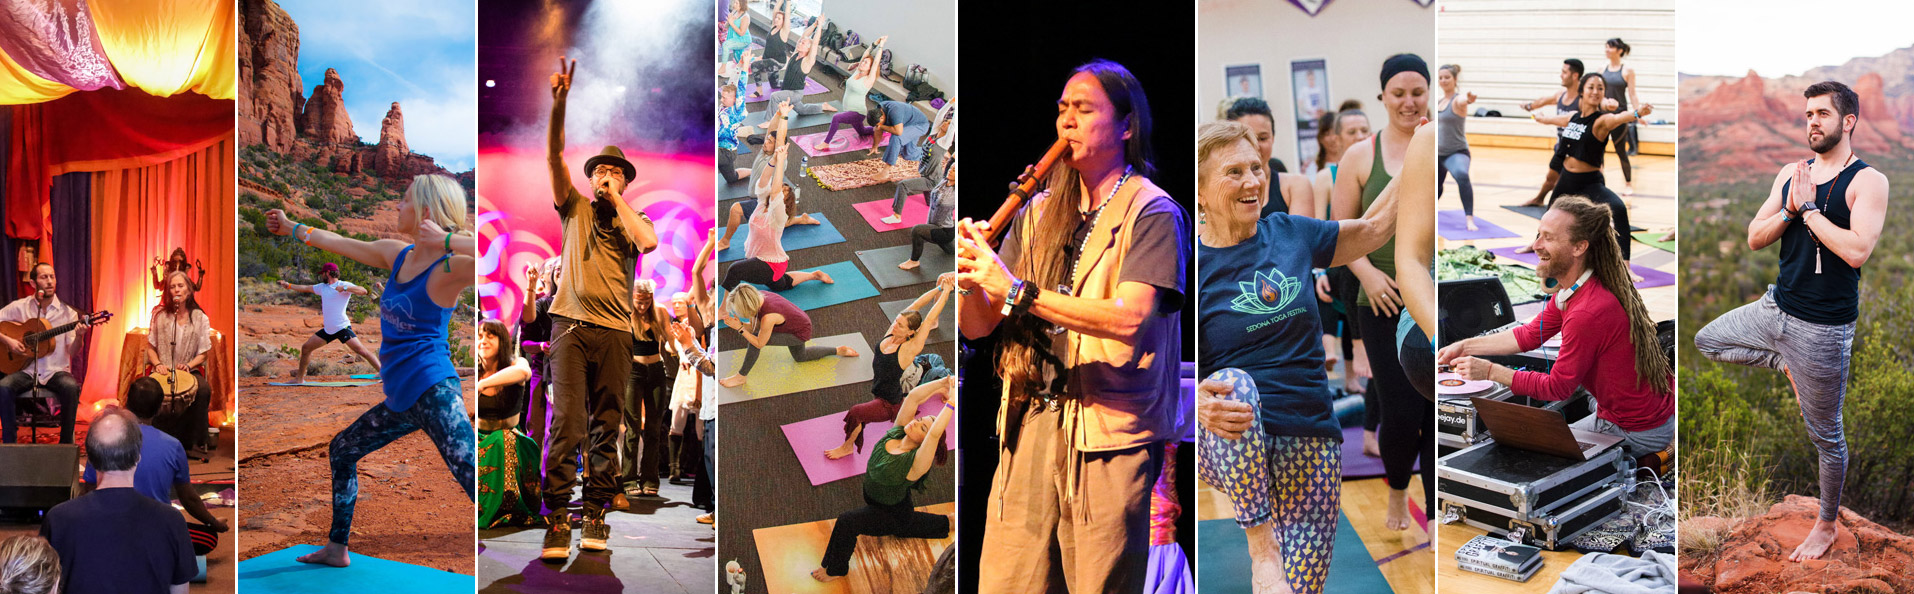 yoga festival yoga conference